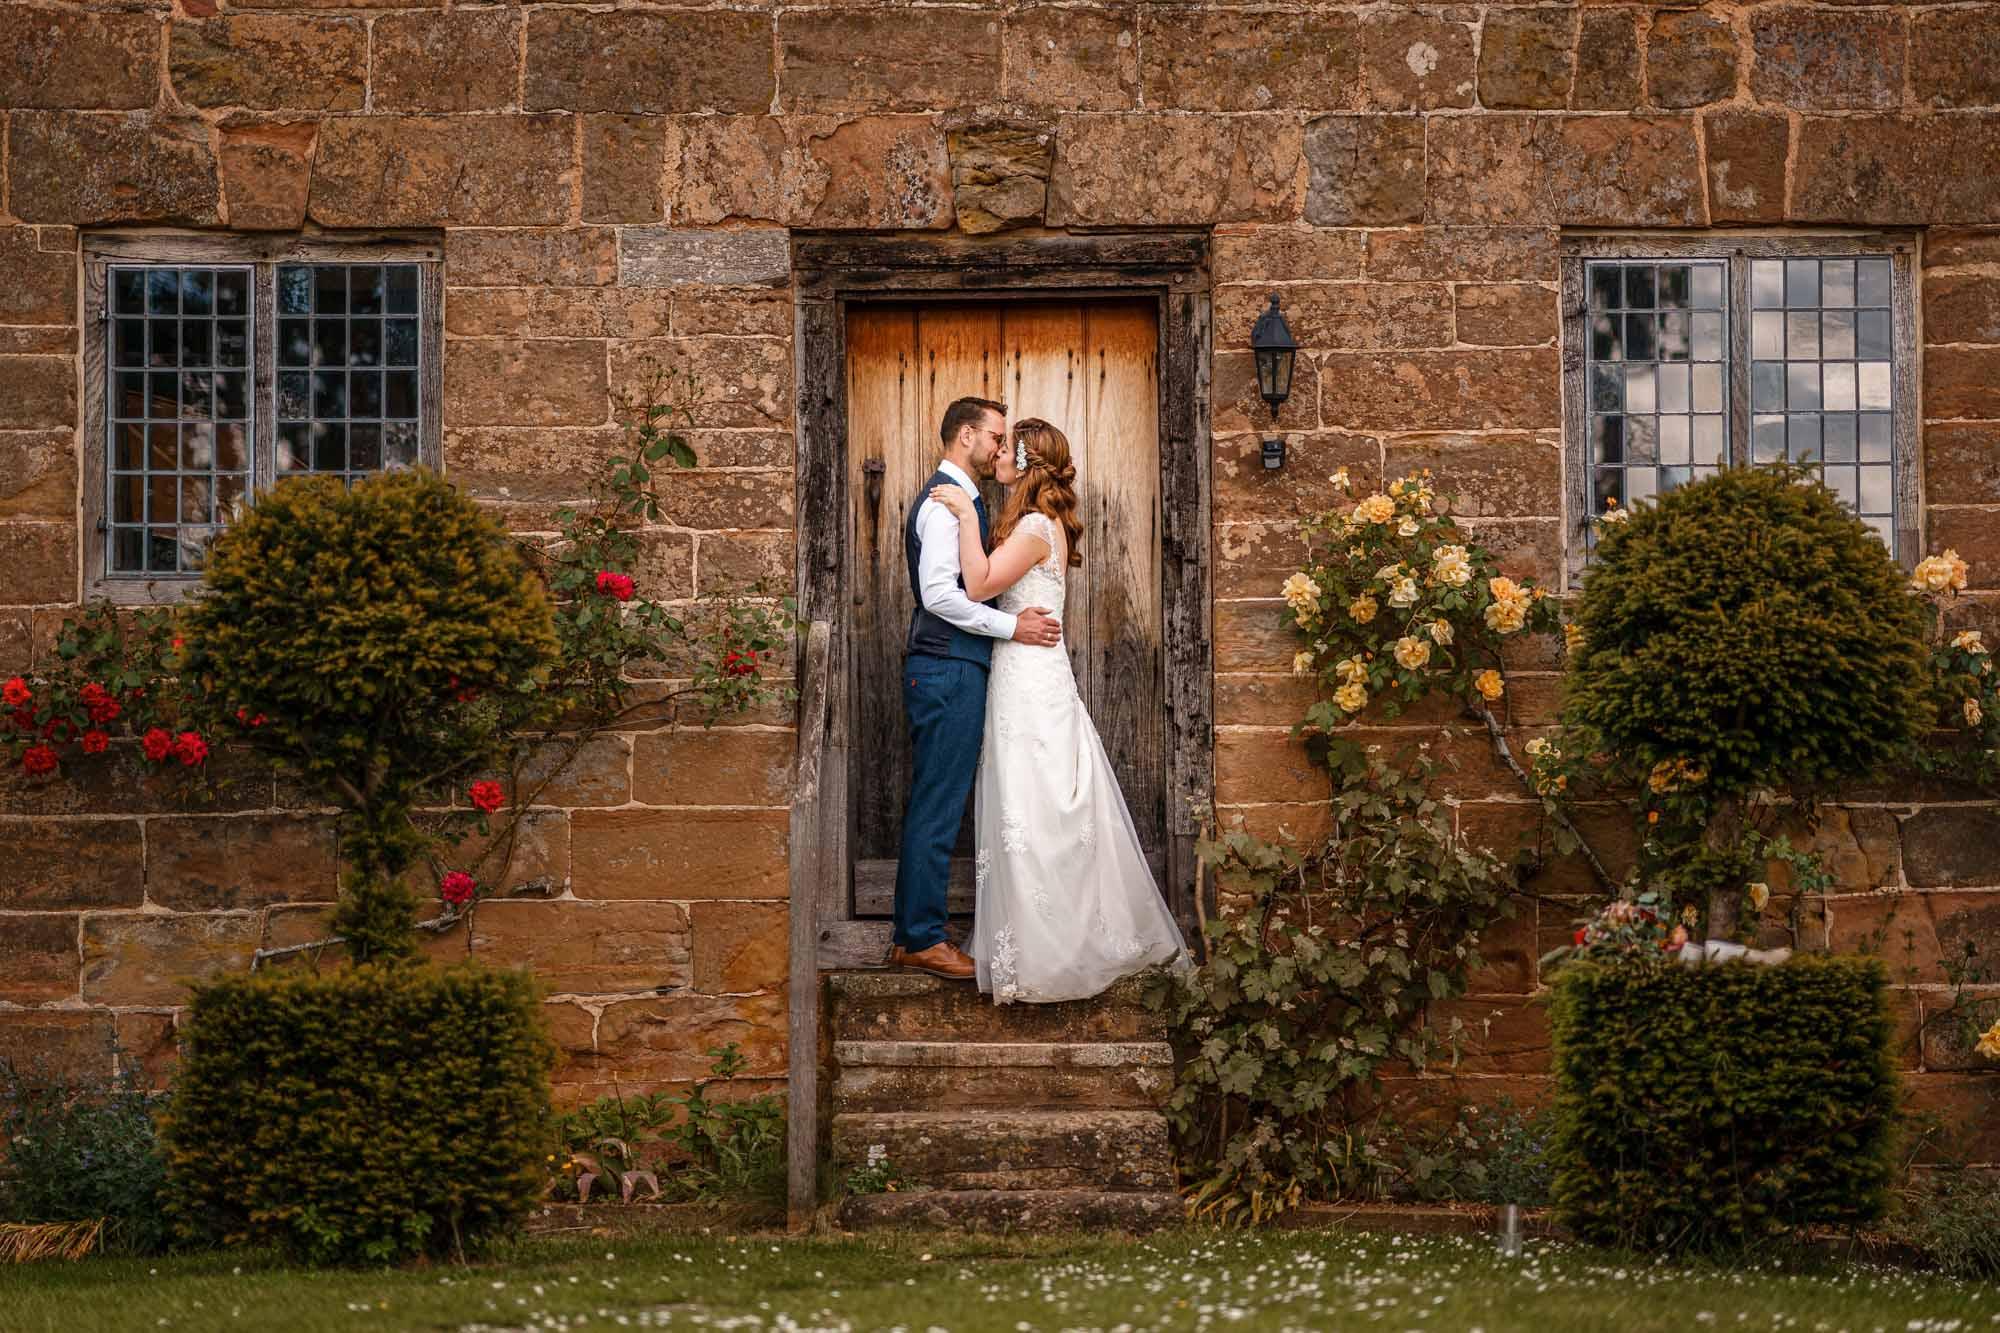 Herefordshire wedding photographer, Wedding Photographer in Herefordshire, West Midlands Wedding Photographer, Best Wedding photography in the west midlands, David Liebst Photography